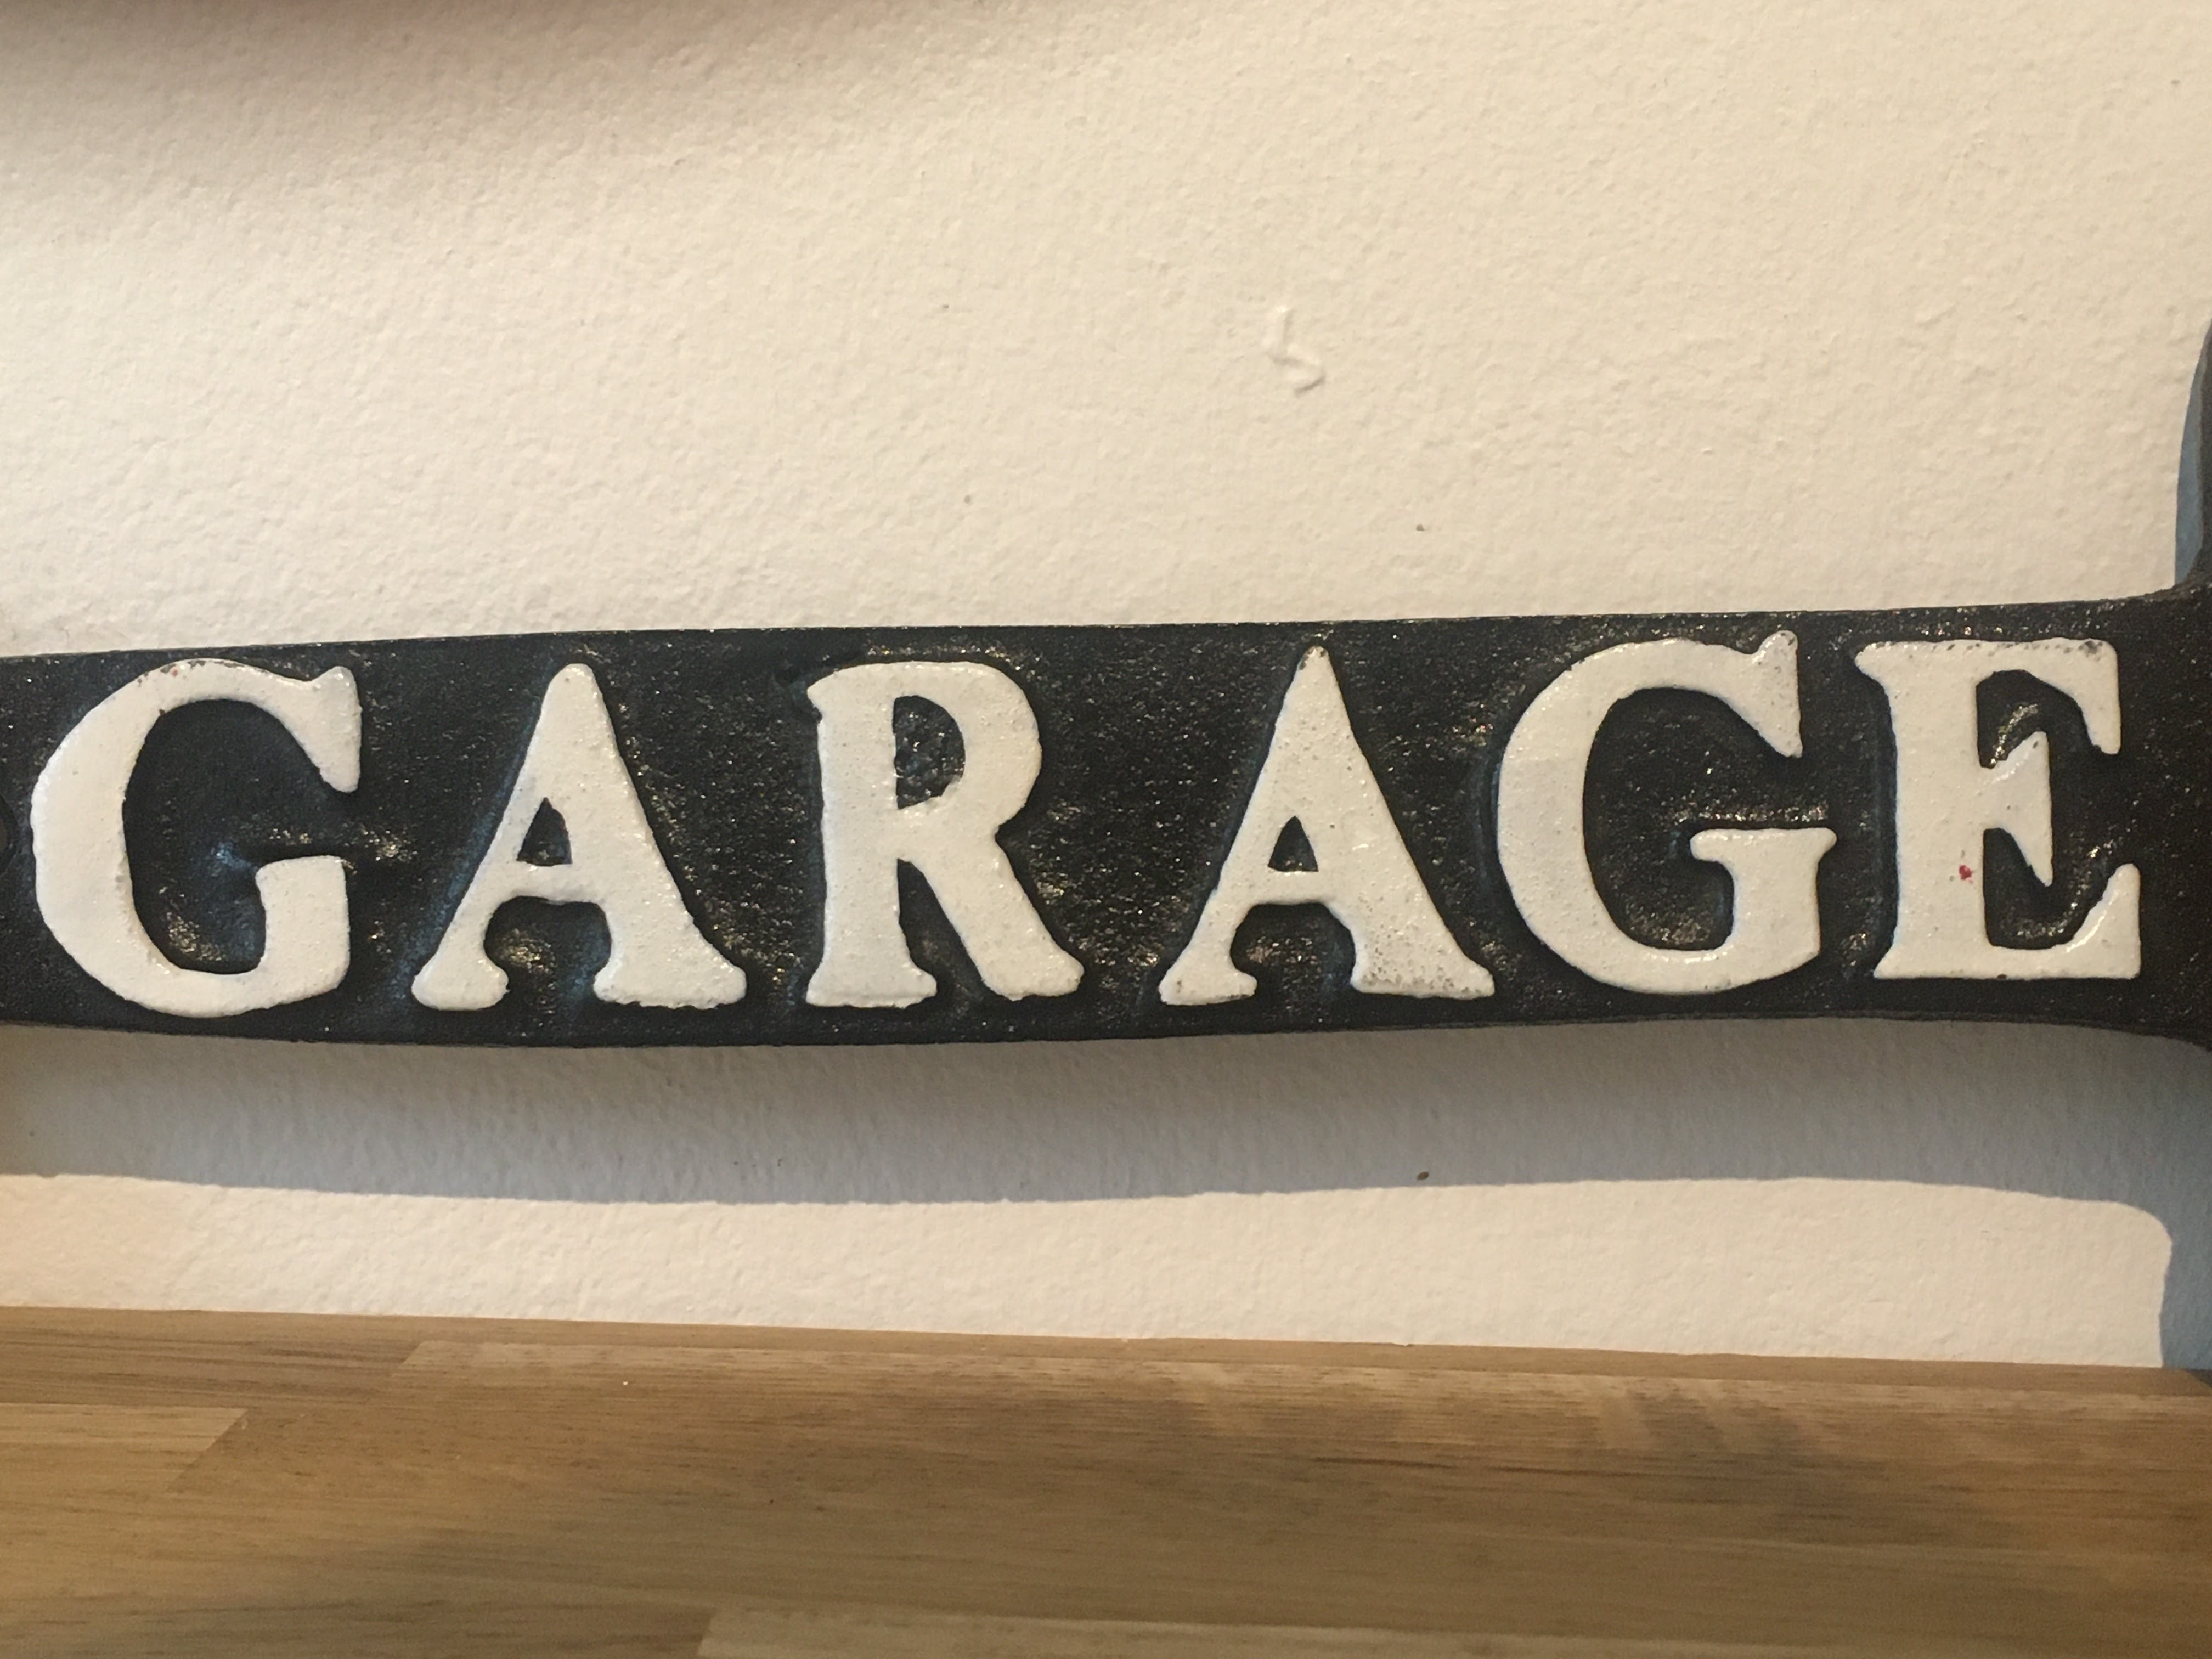 Harley Davidson Motorcycles Cast Iron Garage Arrow Sign - Image 3 of 4